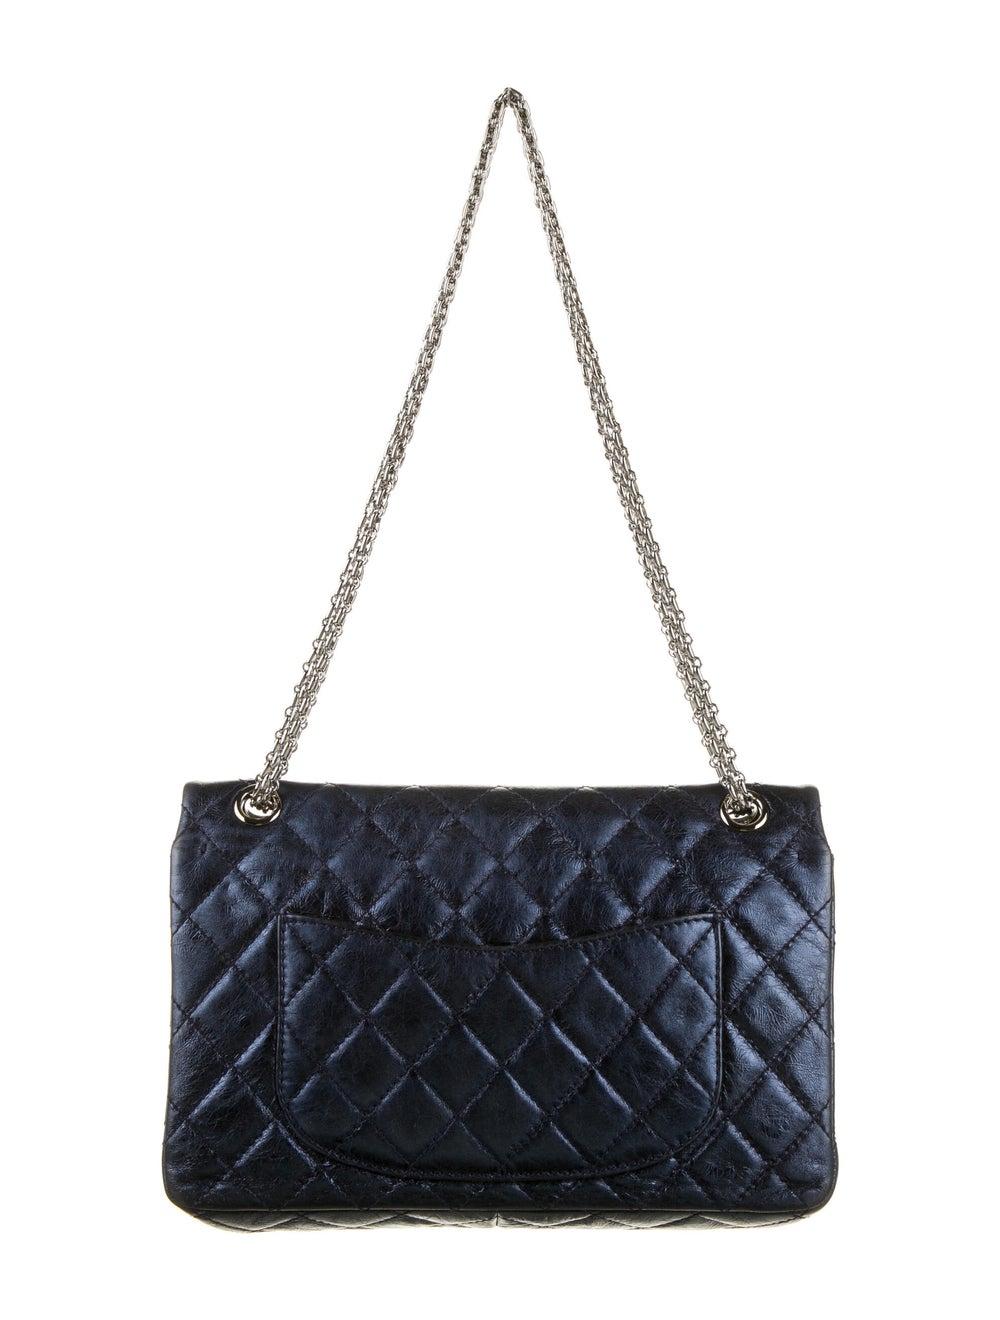 Chanel Reissue 226 Double Flap Bag Blue - image 4